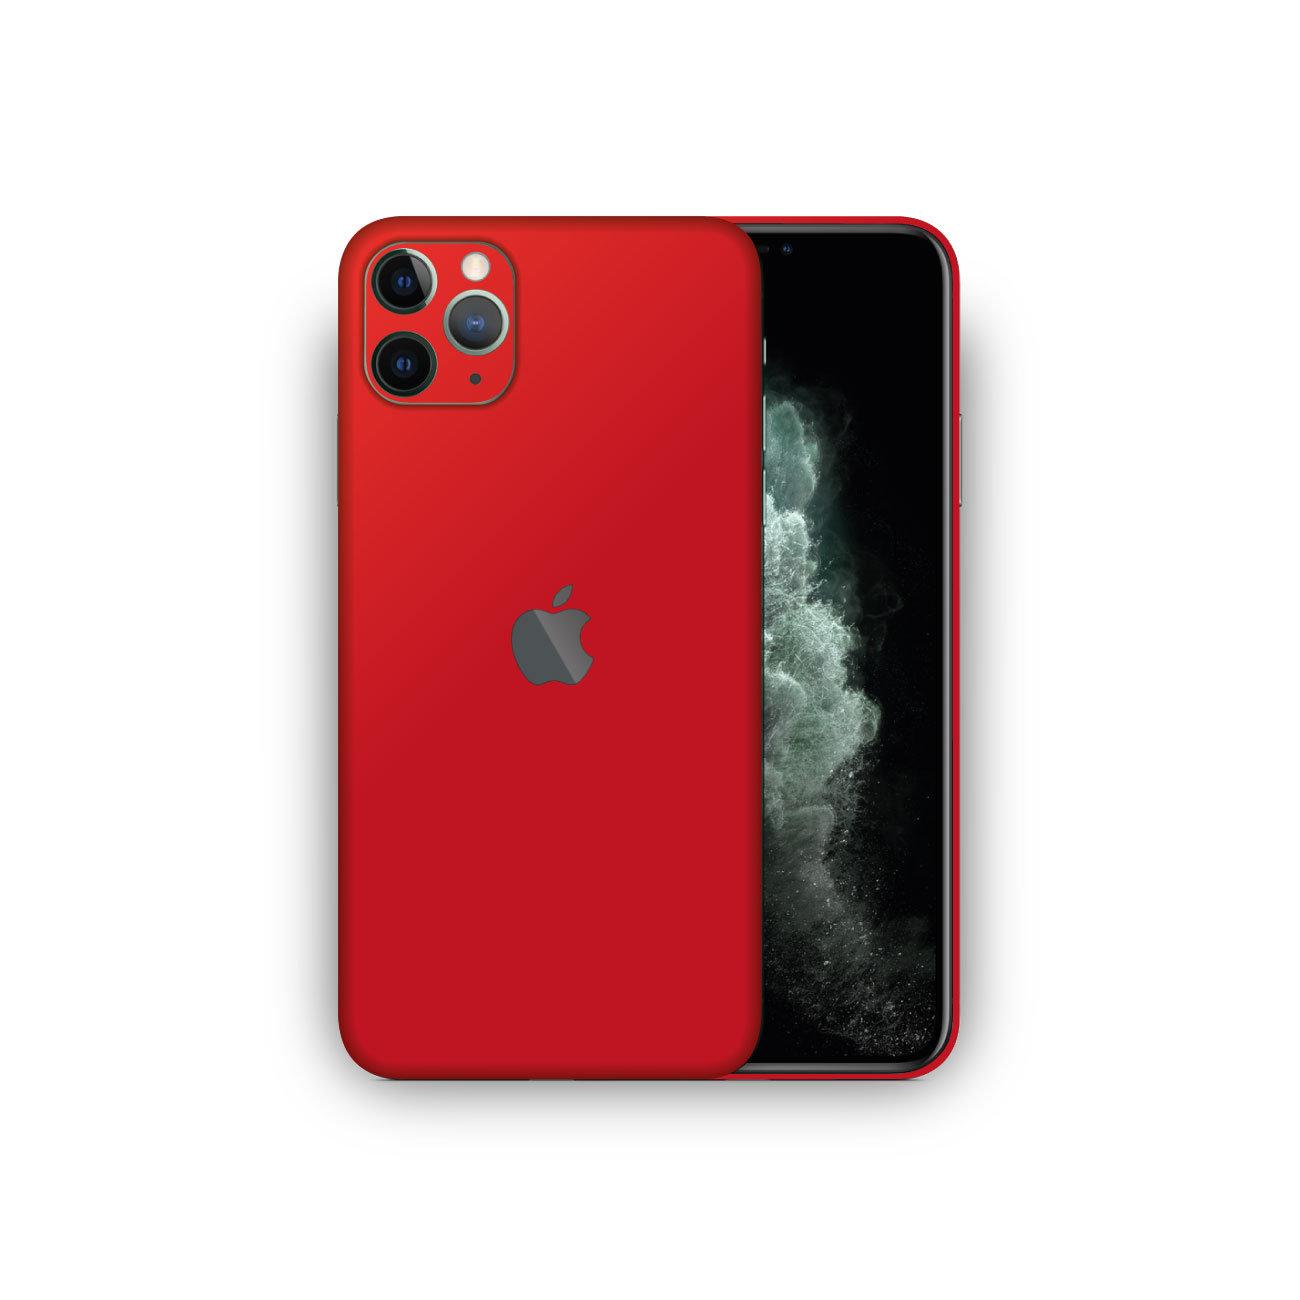 Apple iPhone 11 Pro MATTE RED Skin Vinyl Wrap